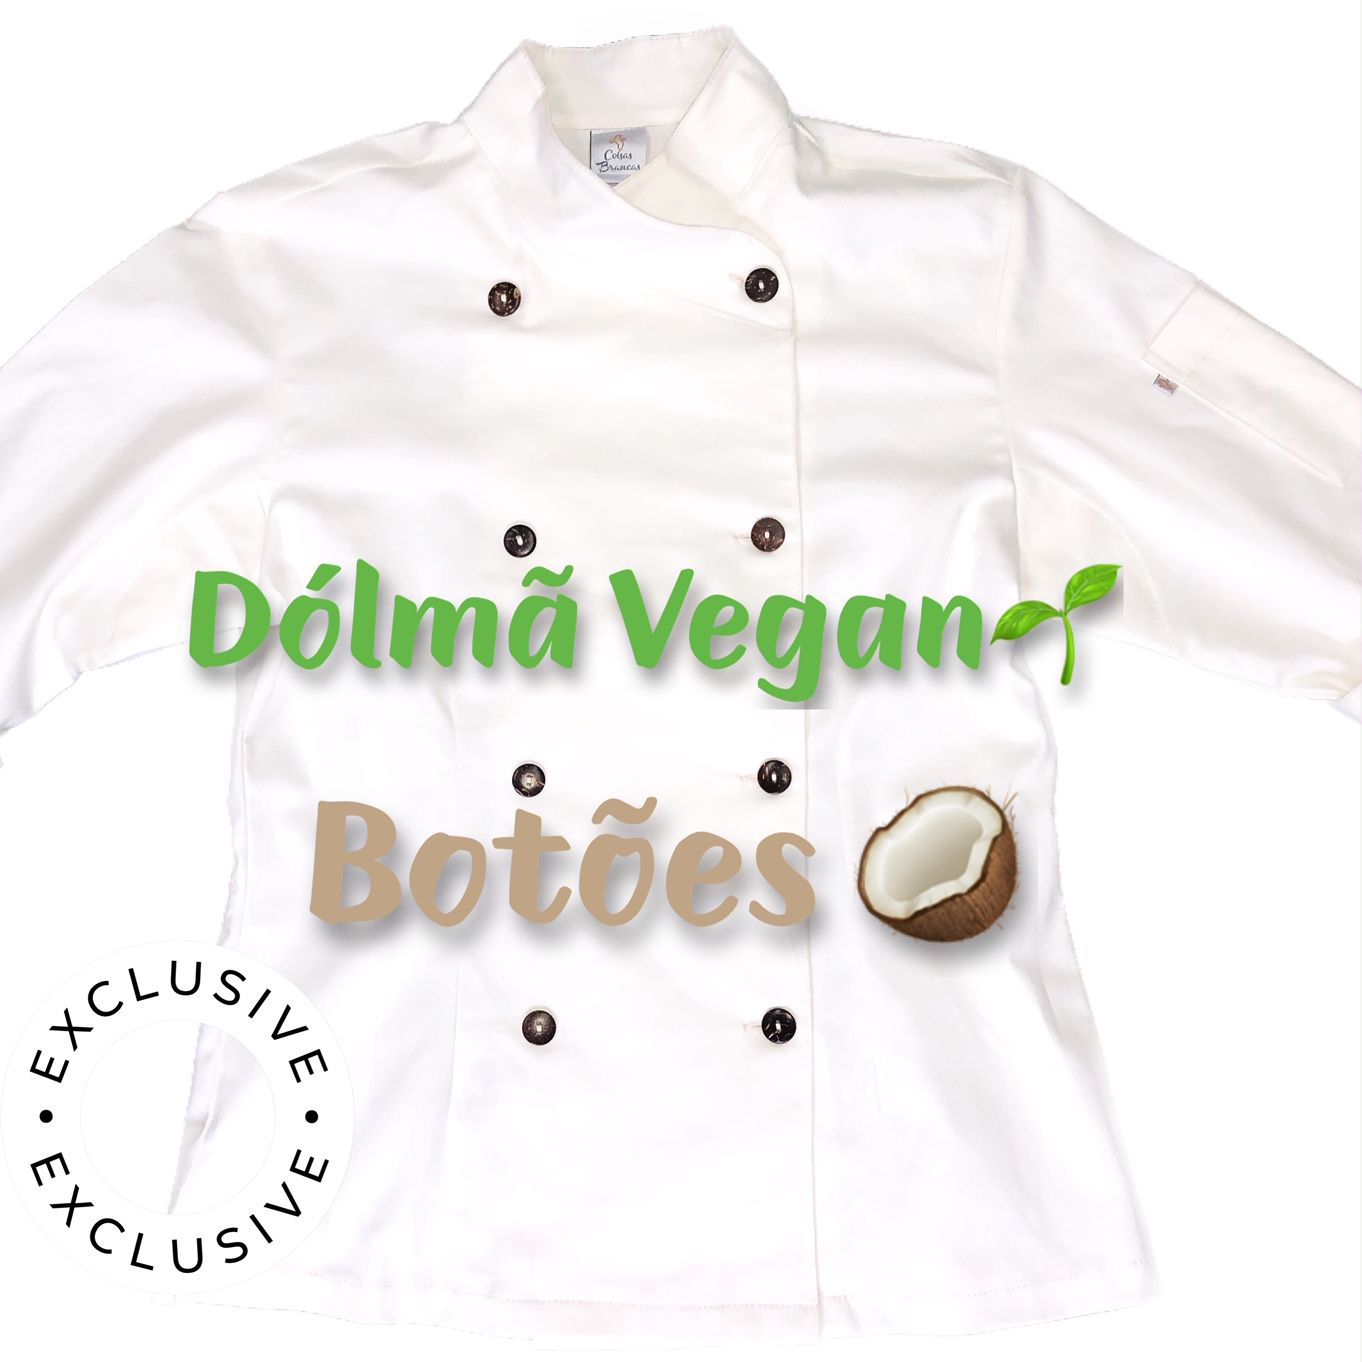 Conjunto Dólmã Cecília Feminino Acinturado VEGANA e botões COCO Sarja Leve 100% algodão + Calça CINZA ANATOMYS  MICROFIBRA CINZA CORDÃO BRANCO